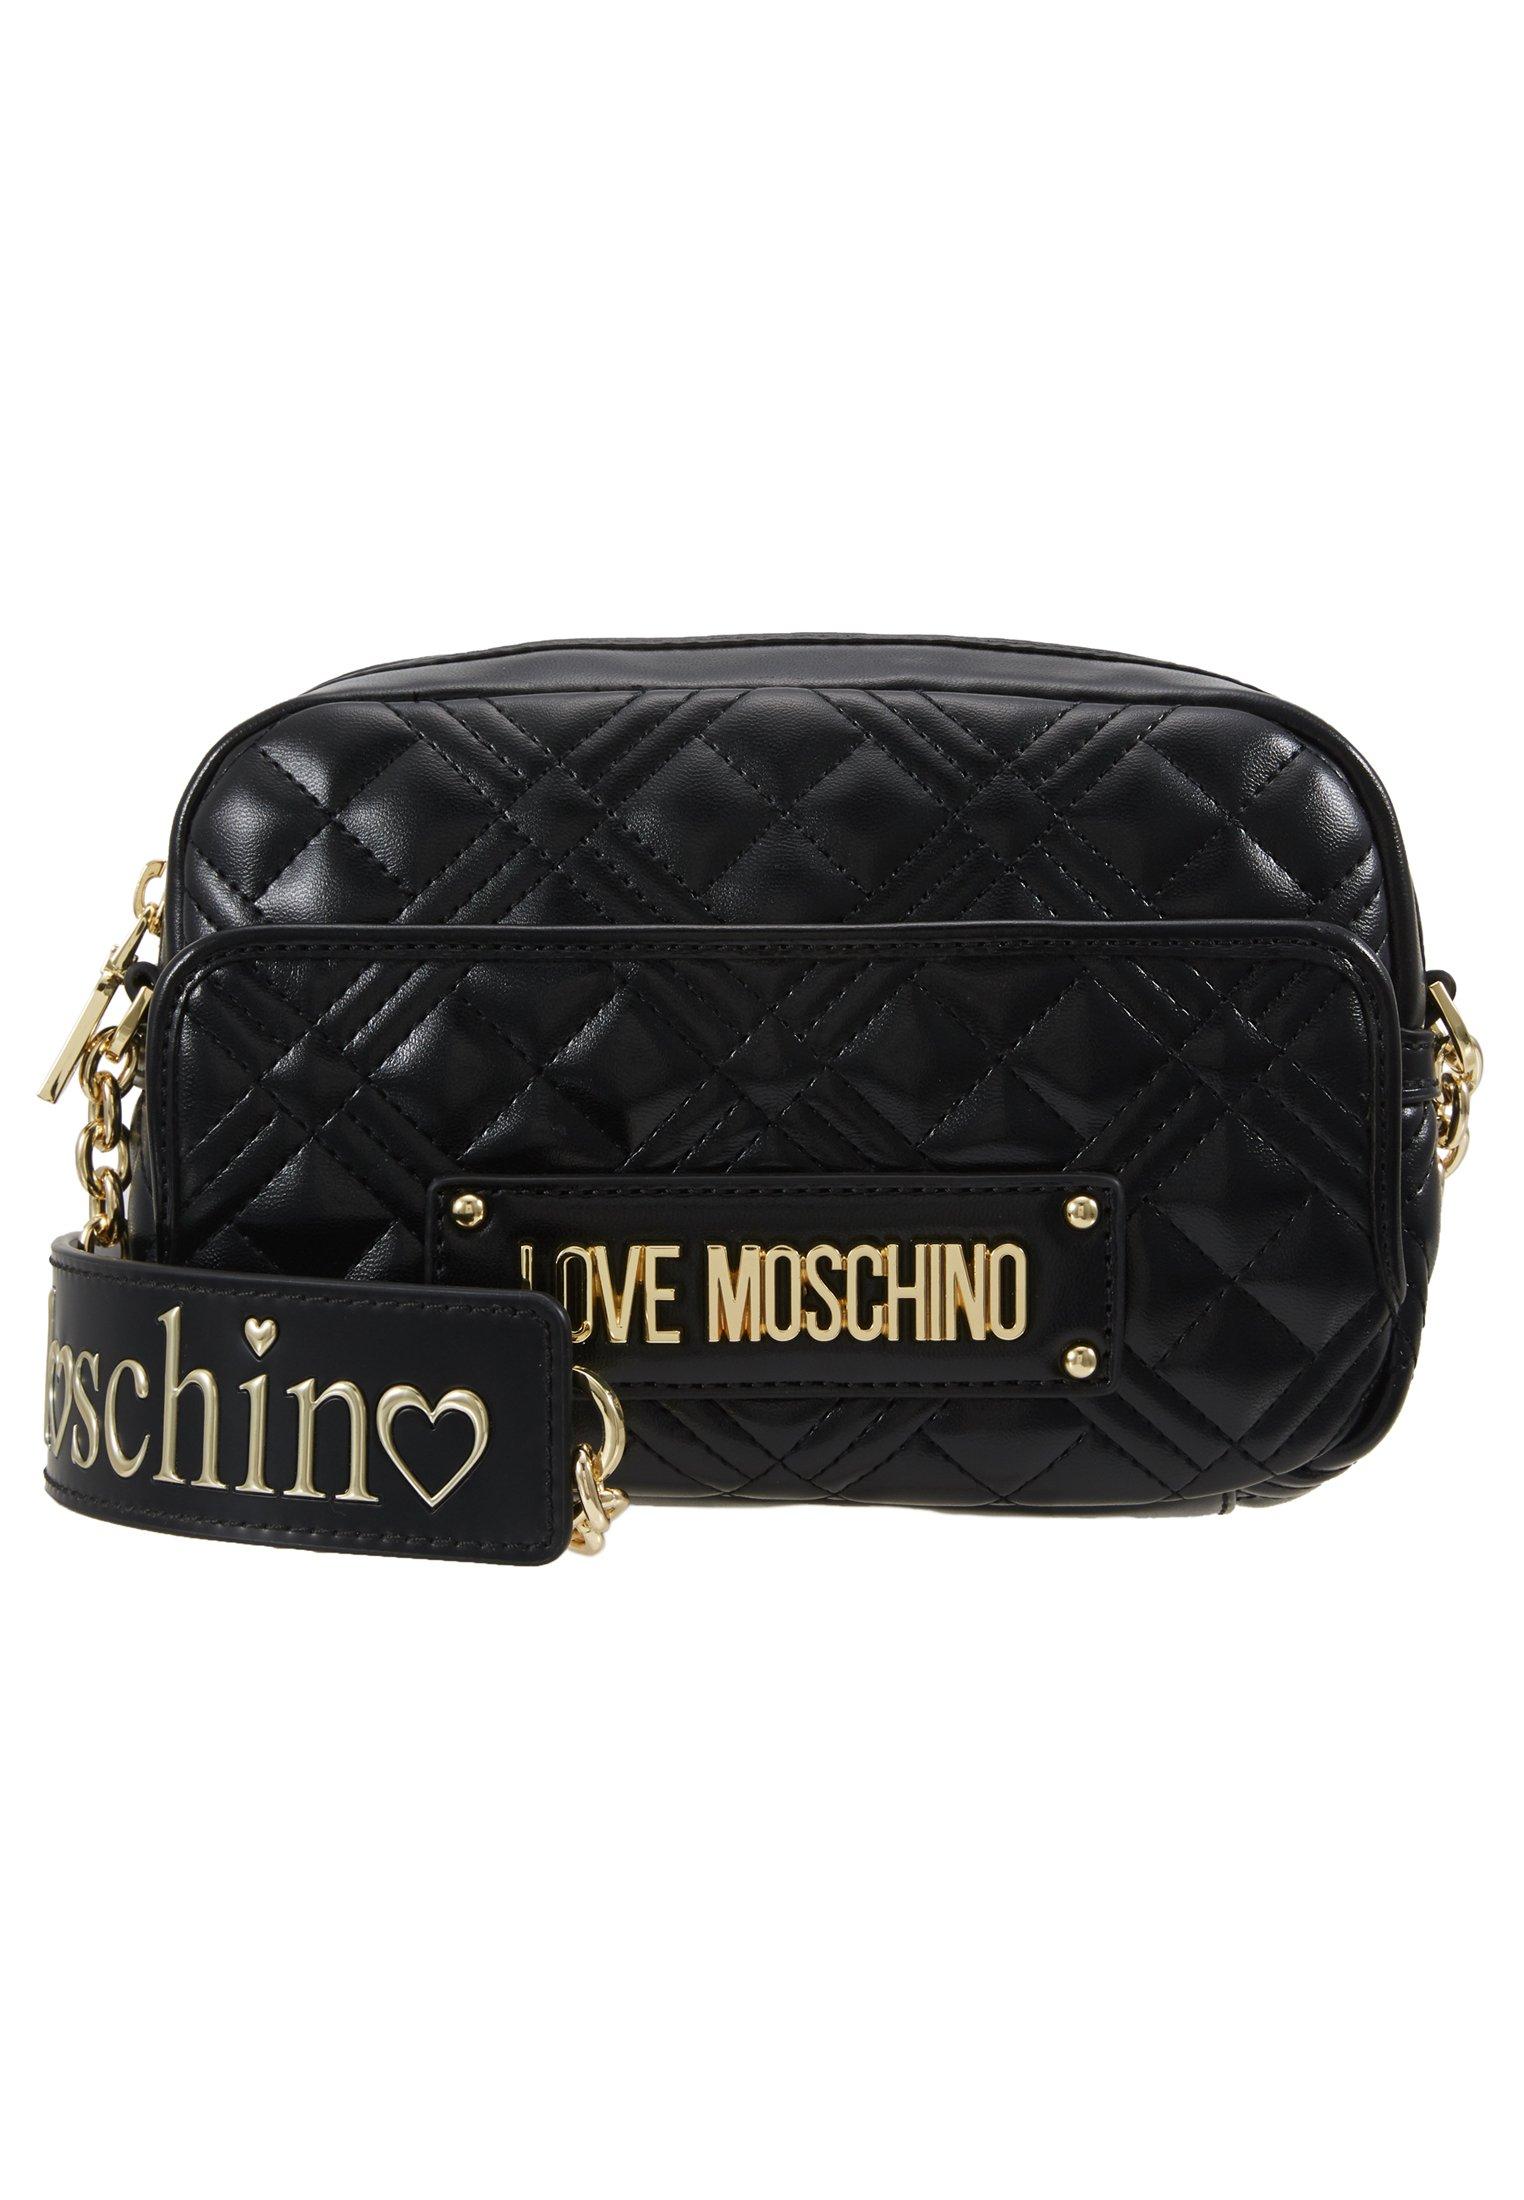 Love Moschino Sac Bandoulière - Black